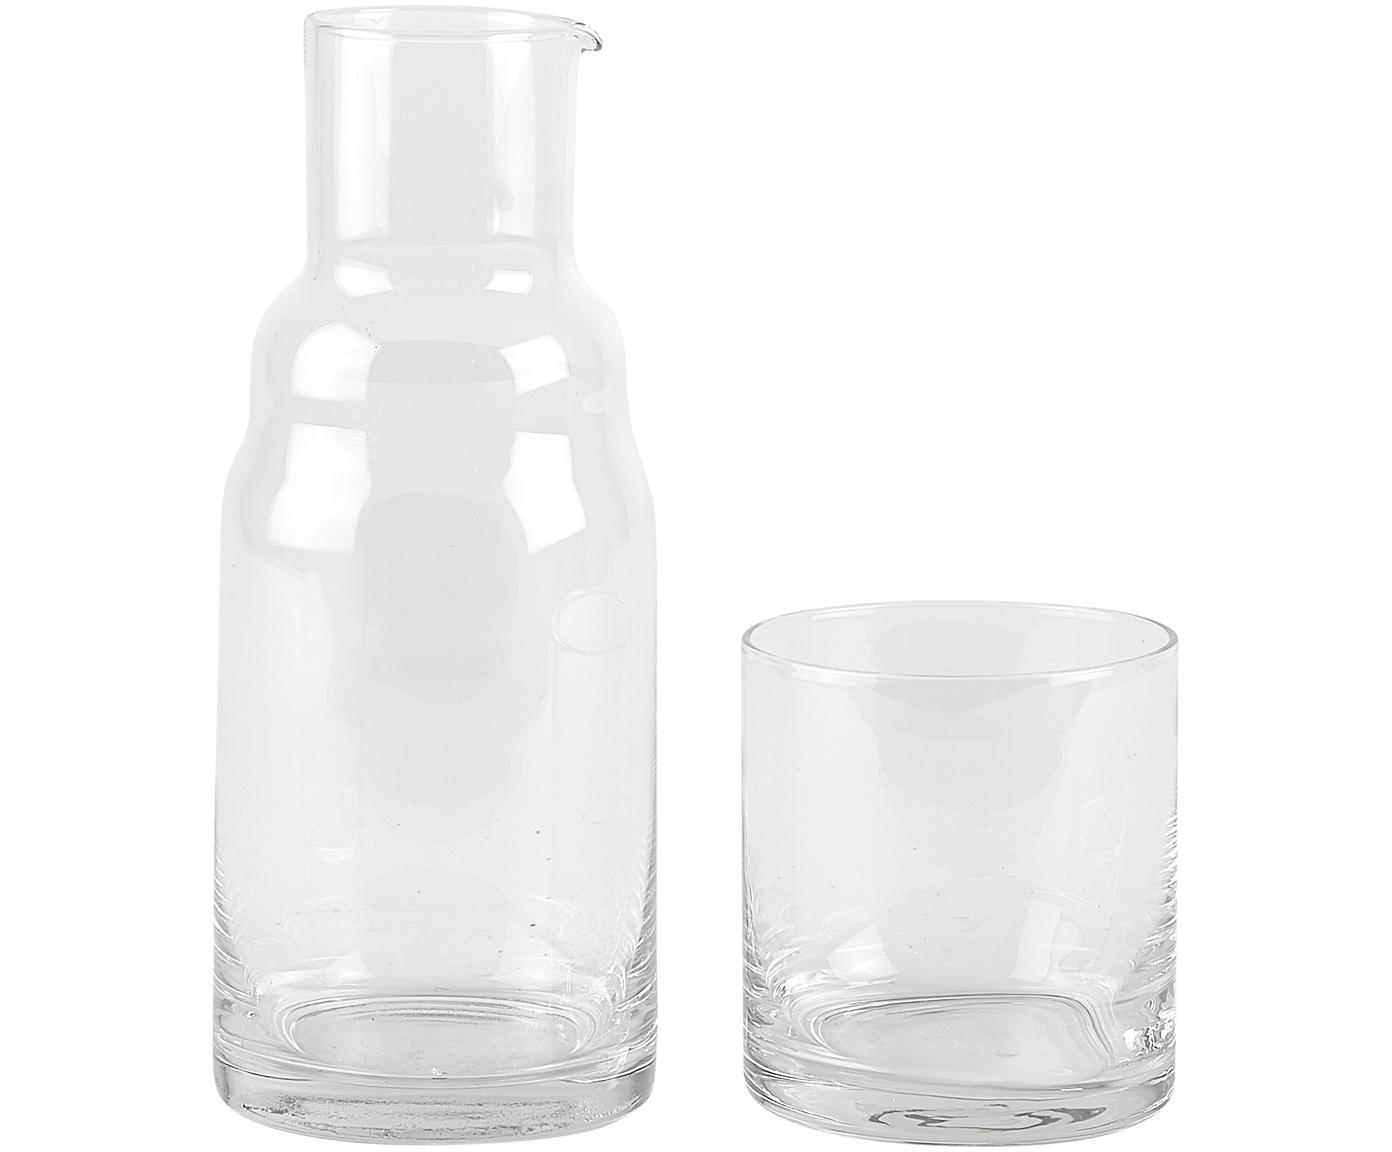 Karaffen-Set Wadi, 2-tlg., Glas, Transparent, Ø 8 x H 21 cm